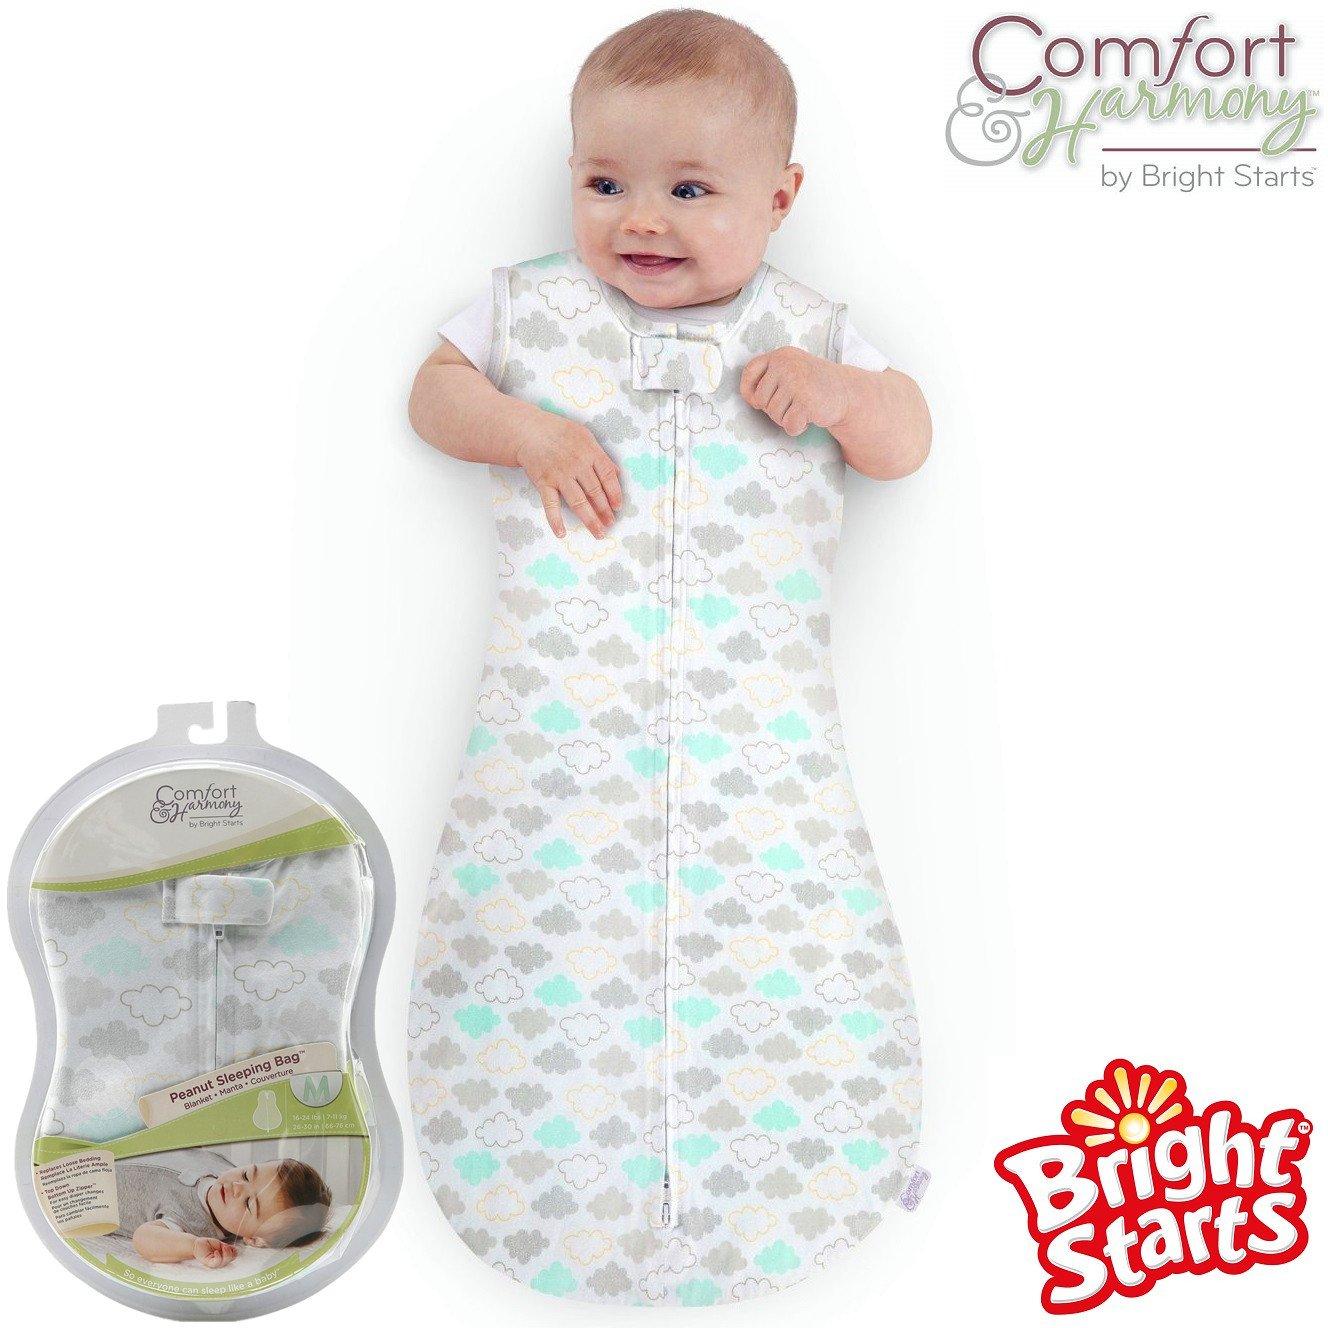 Bright Starts® Comfort & Harmony Swaddle Baby Blanket Peanut Sleeping Bag Unisex Boy Girl 100% Pure Cotton (L, White)